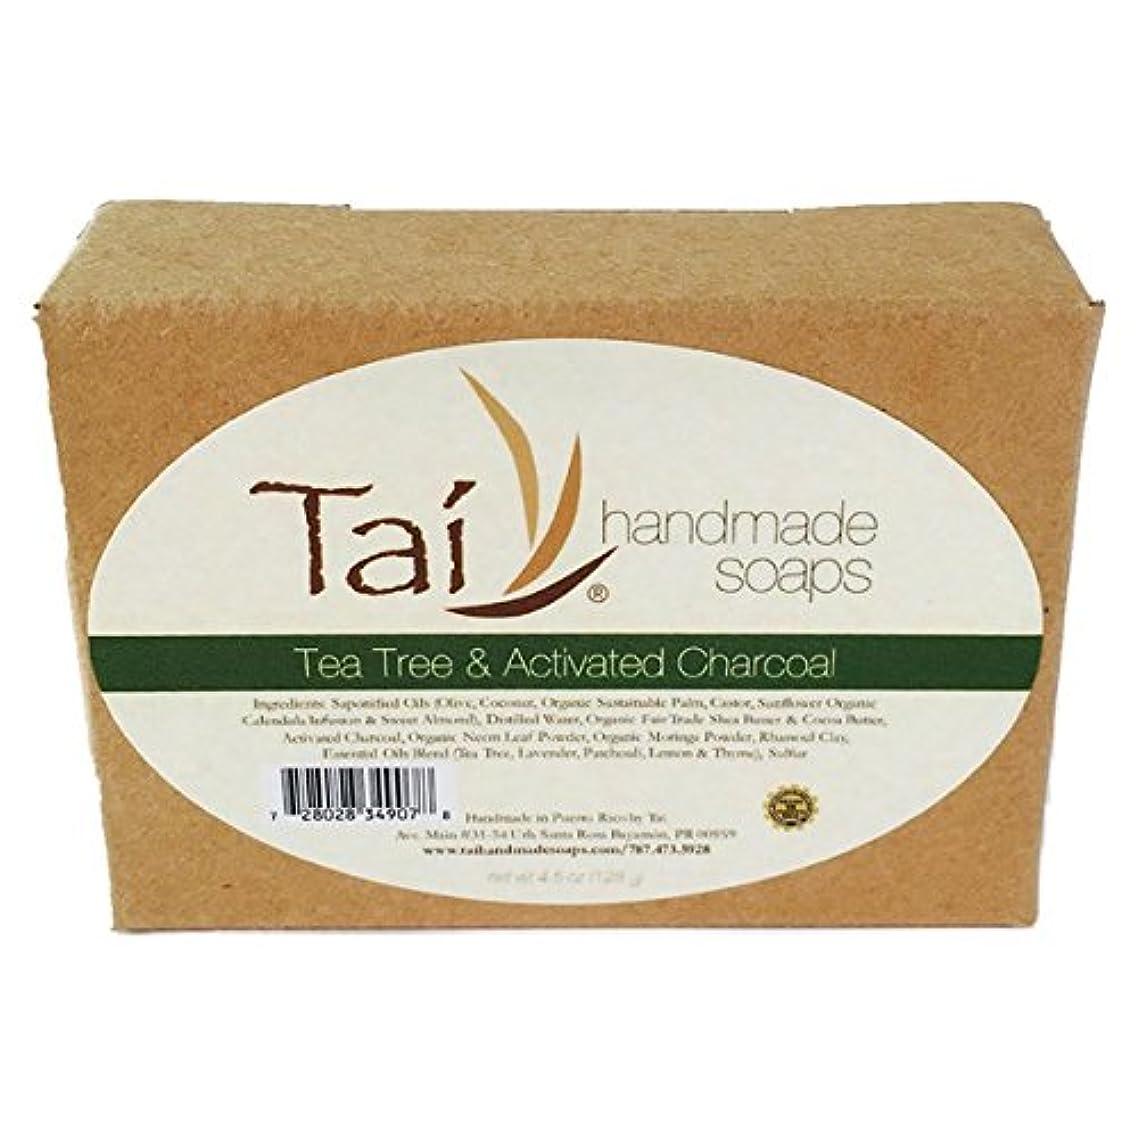 Organic Natural Handmade Soaps - Tea Tree & Activated Charcoal - 4.5 oz Bar